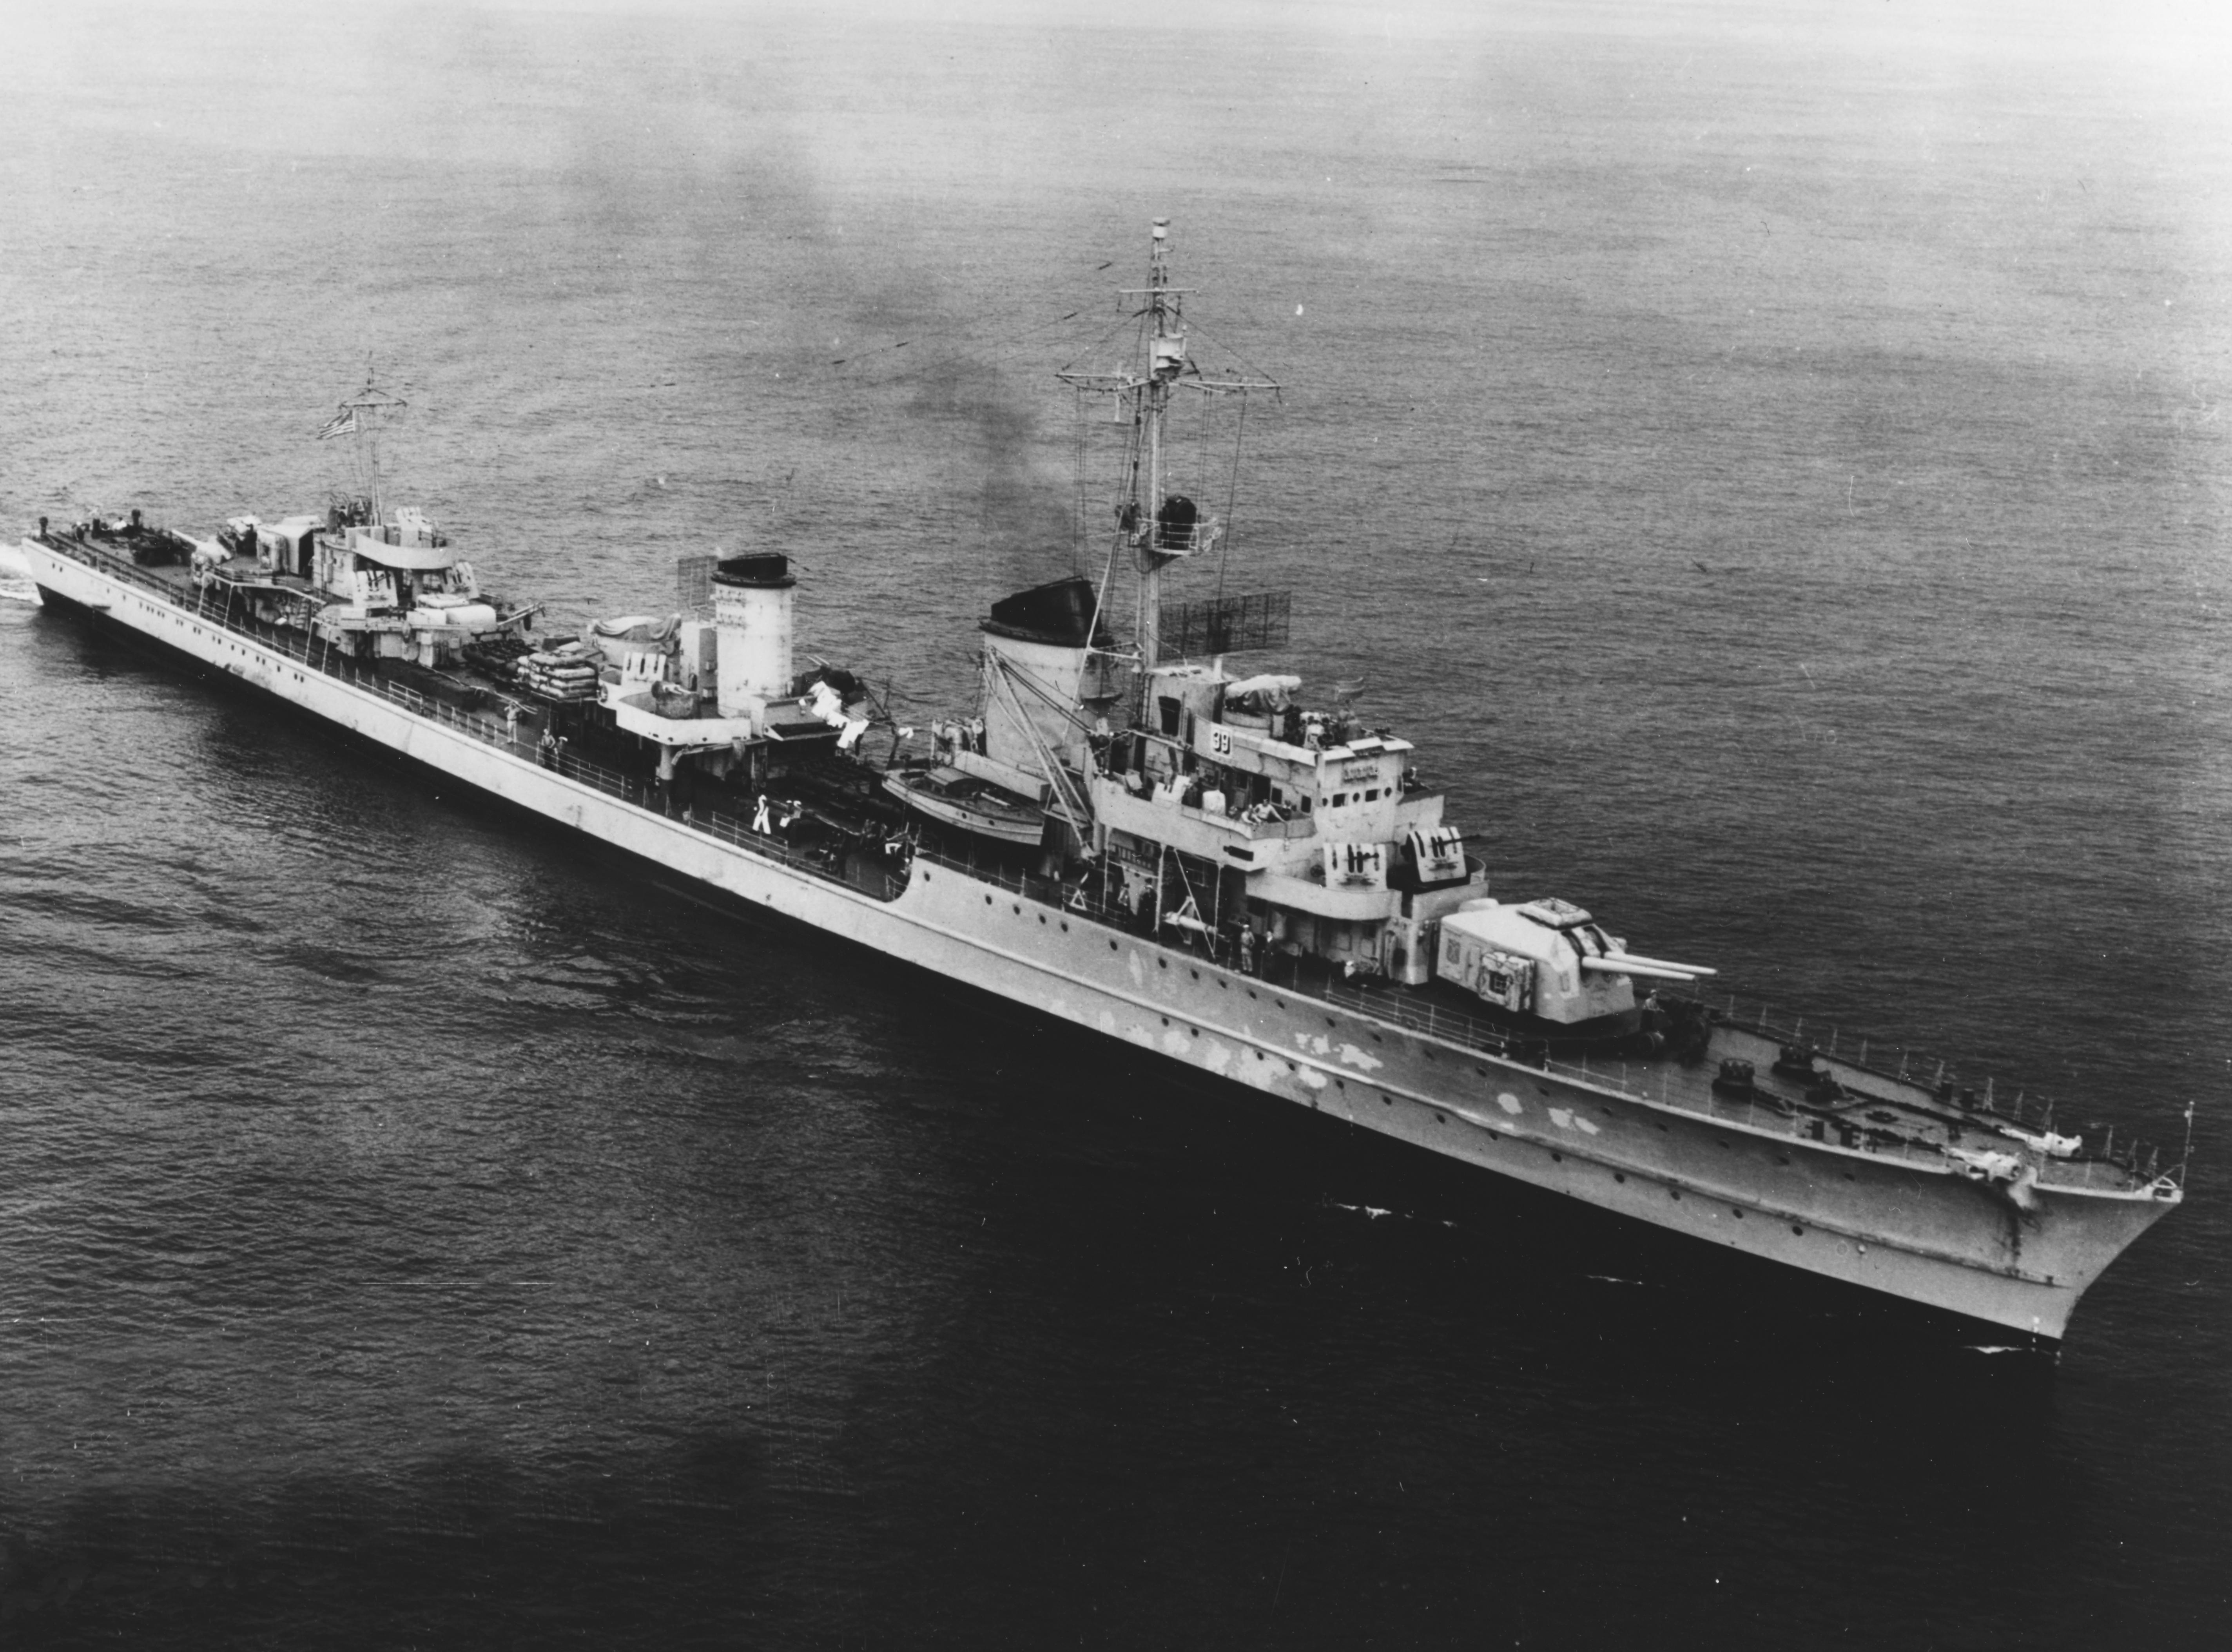 German destroyer Z39 underway off Boston on 12 September 1945 - Potential Split lines